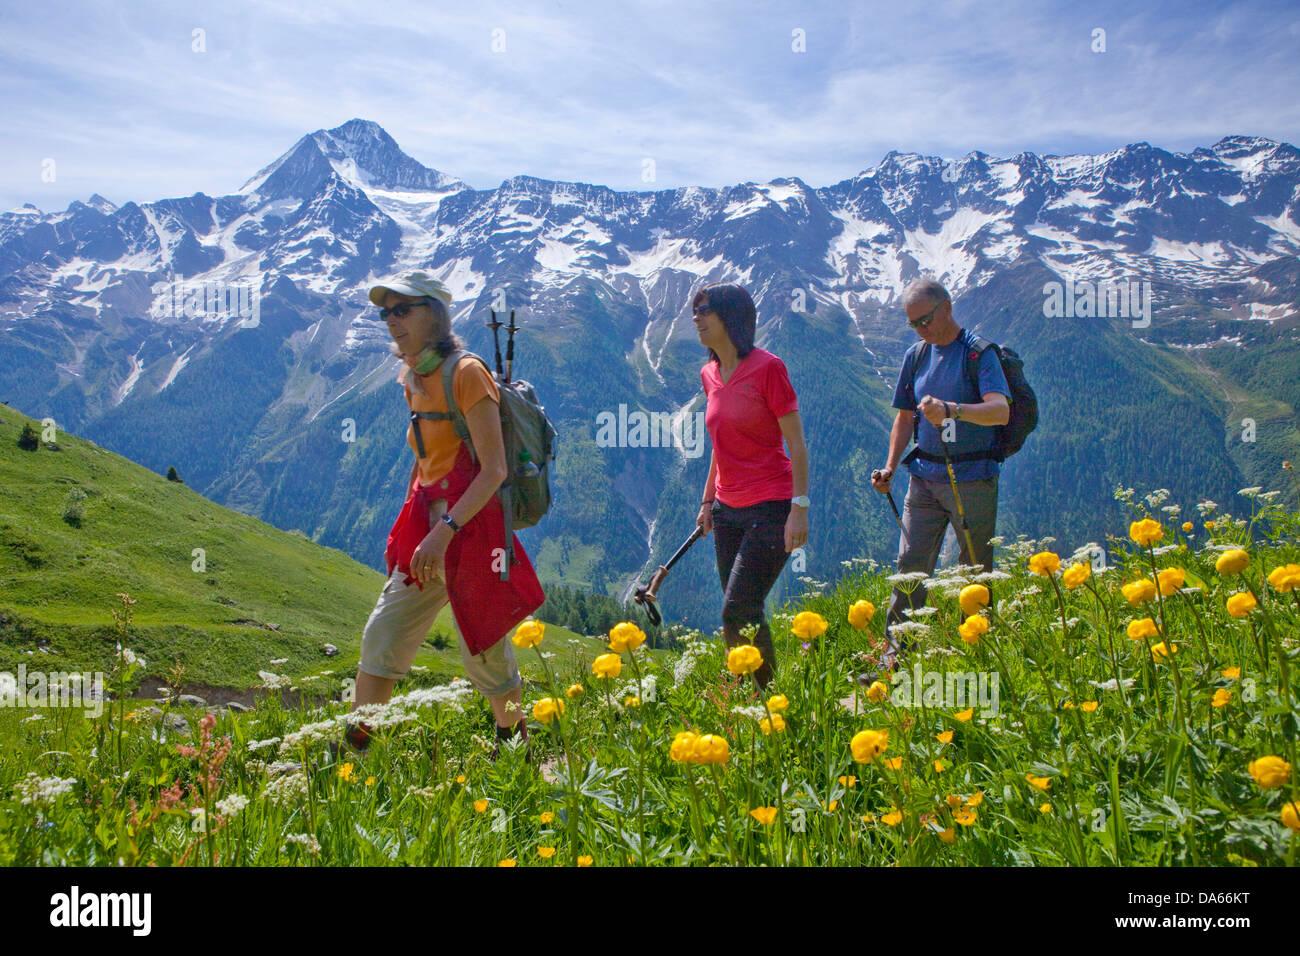 Walking, Hiking, Lötschentaler height way, height way, view, Bietschhorn, canton, Valais, mountain, mountains, - Stock Image